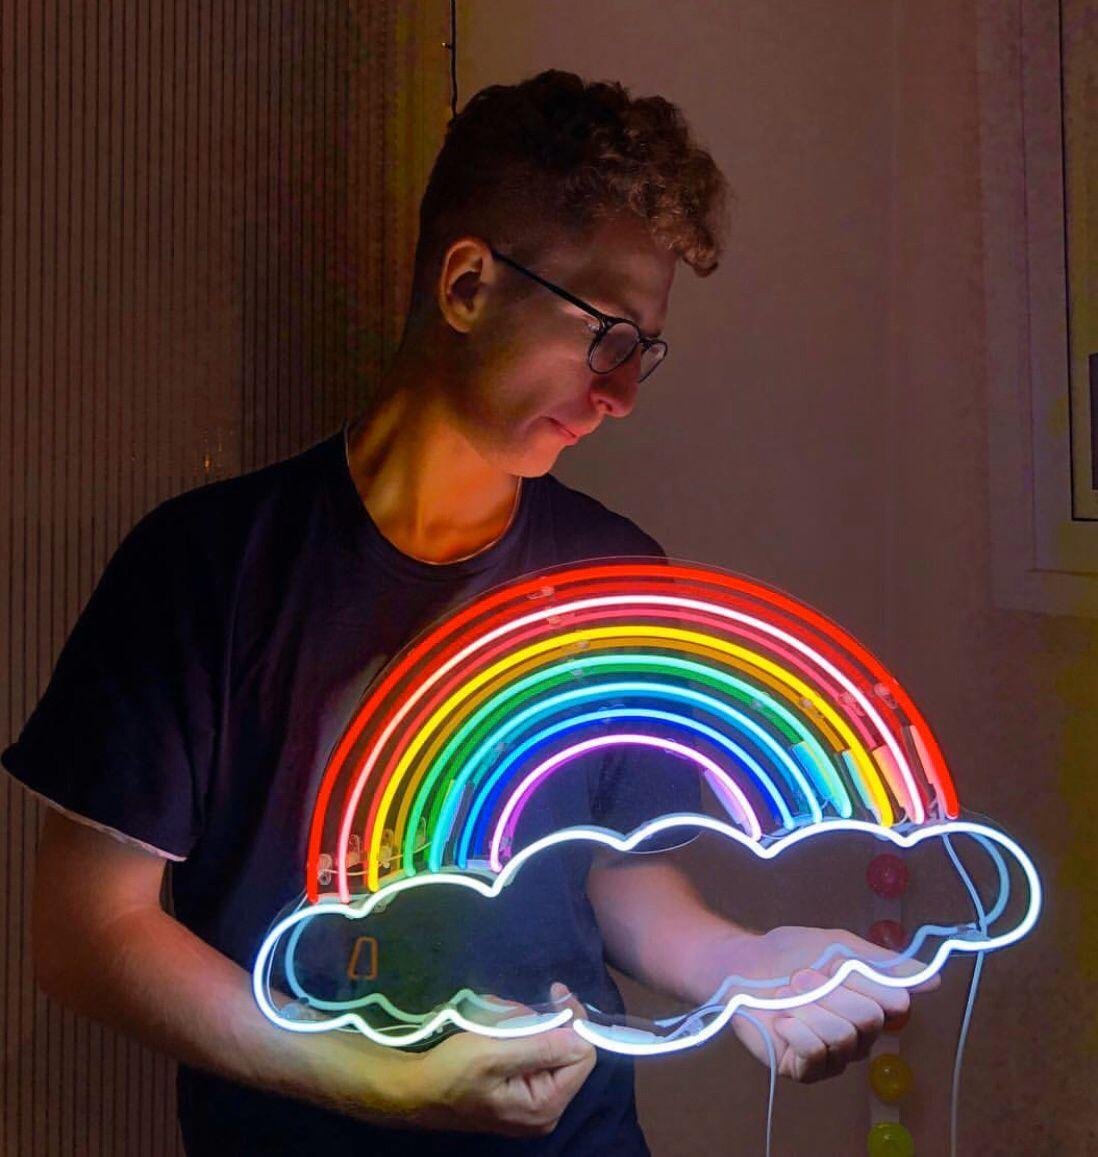 RAINBOW NEON SIGN HANDICRAFT ضوء البيرة BAR PUB توقع ريال GLASS TUBE LOGO إعلانات DISPLAY NEON 17/19/24